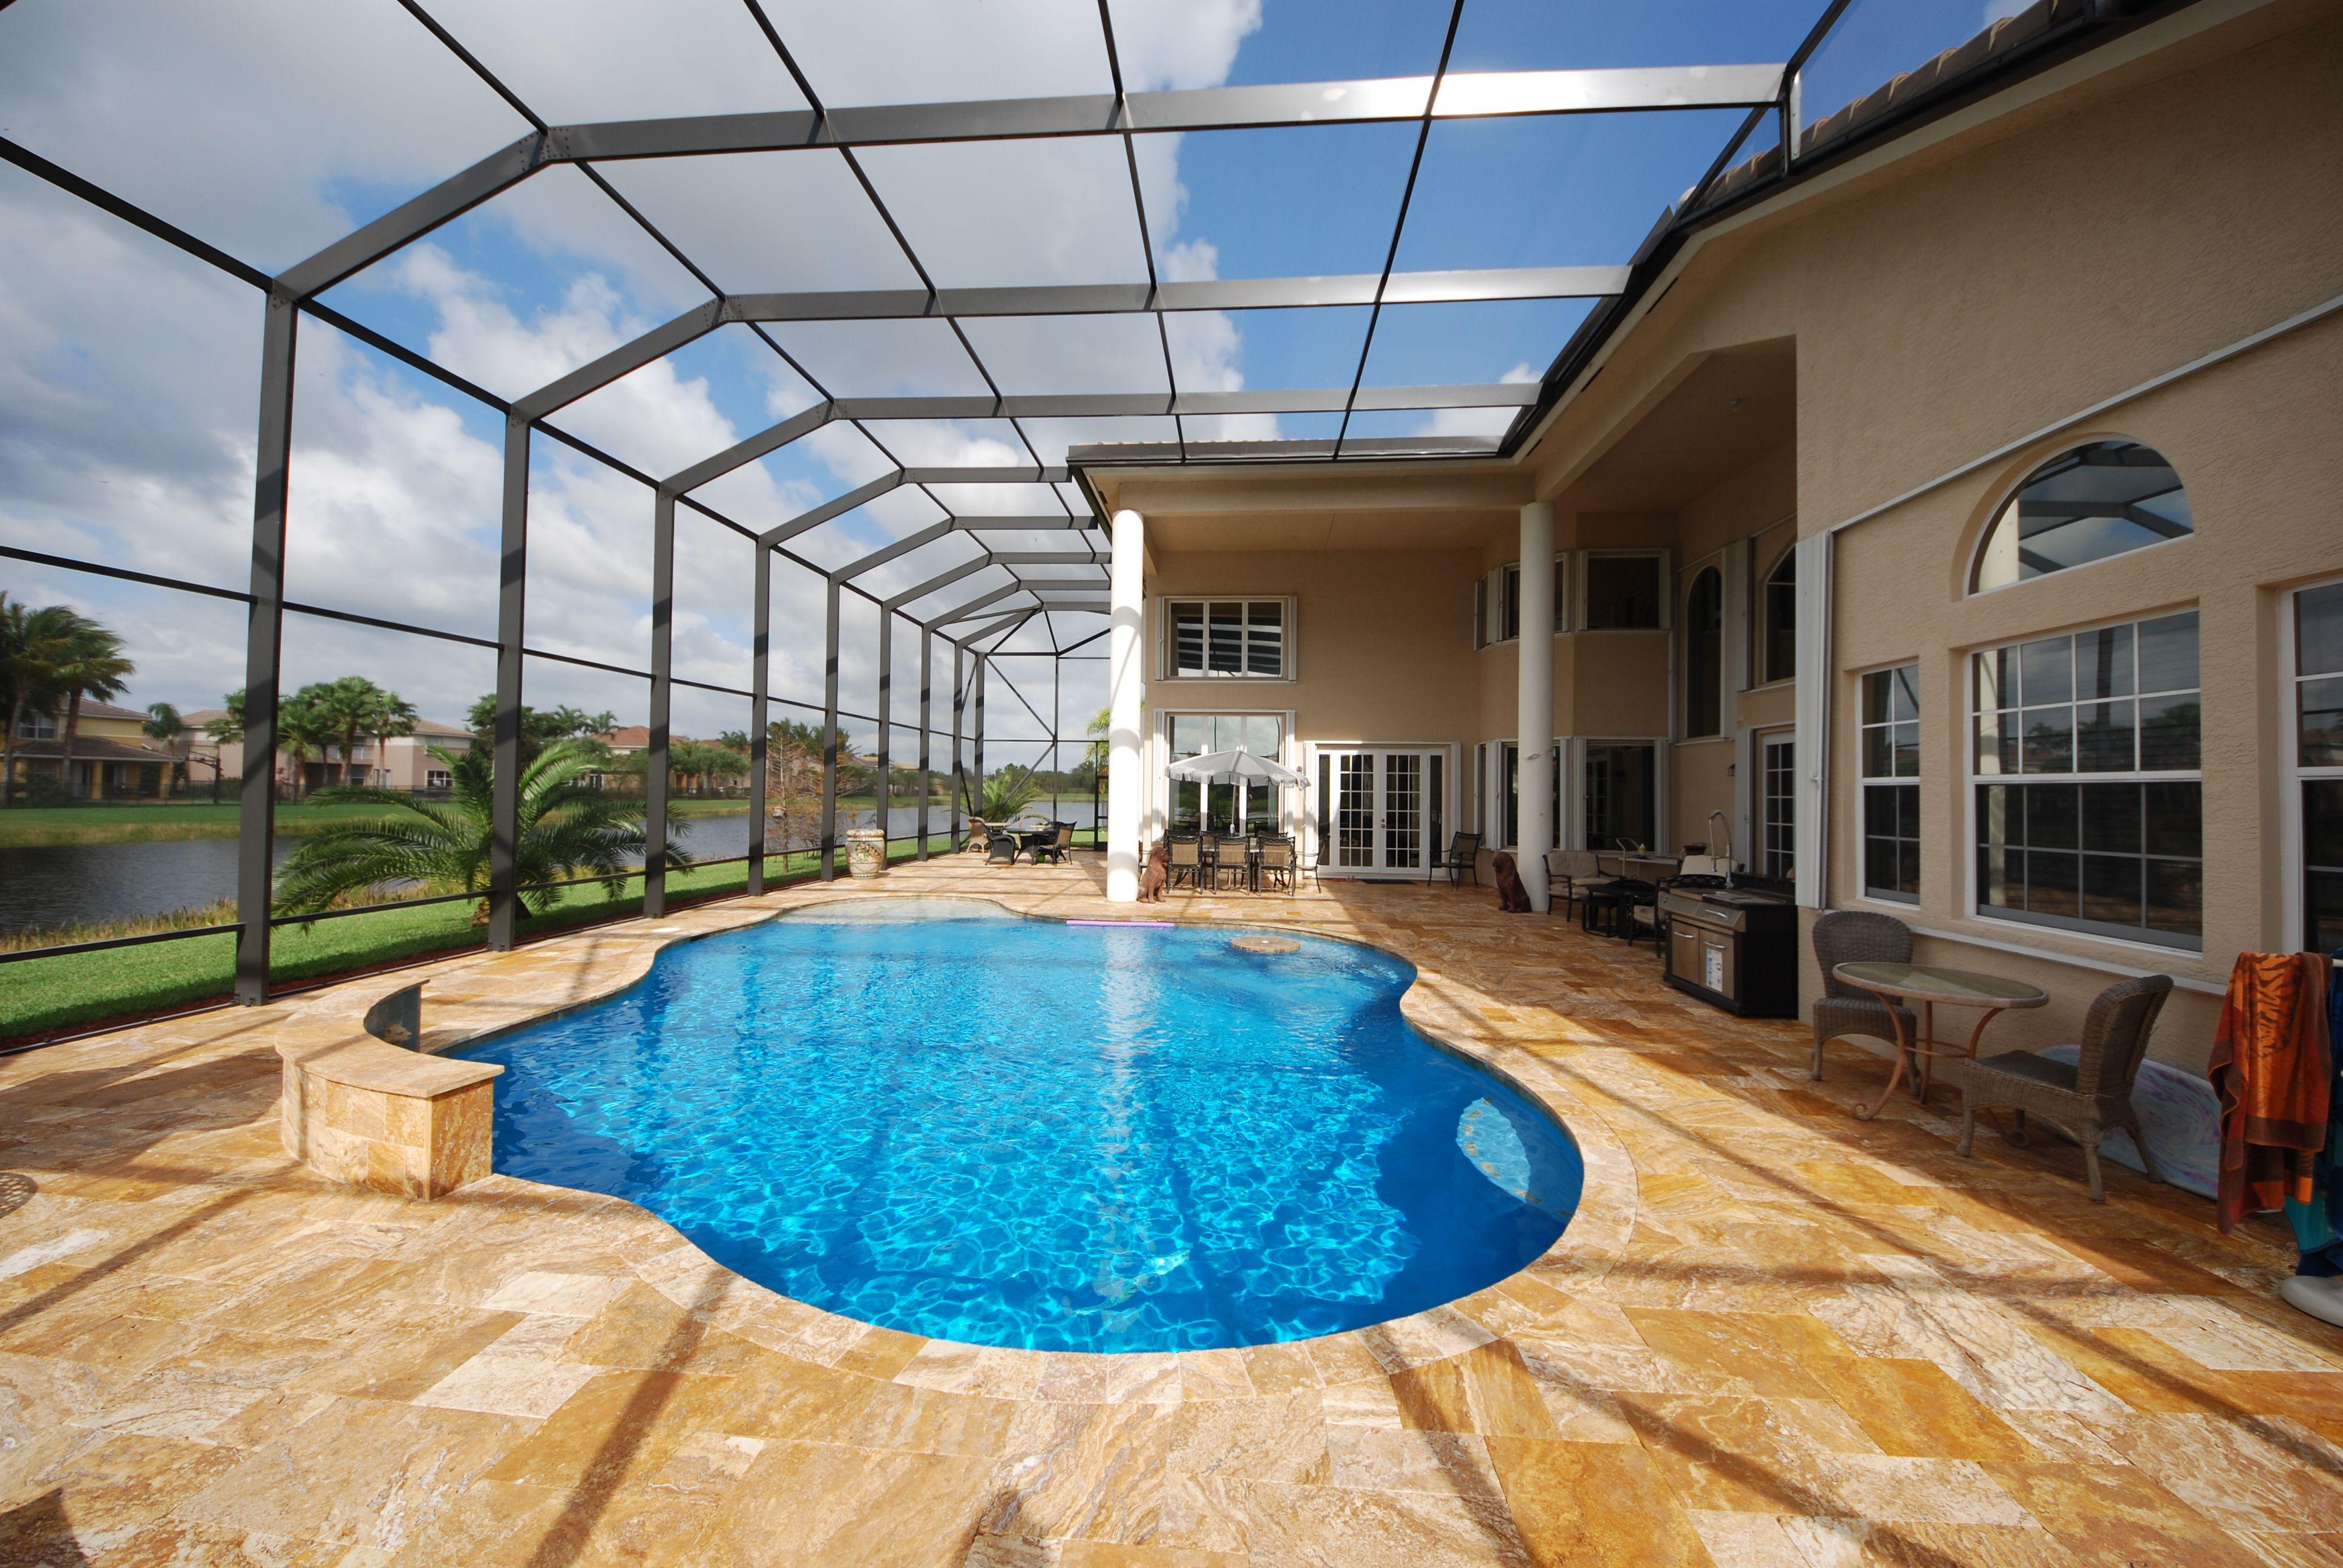 Two Story Pool Enclosure Screen Enclosures Pool Enclosures Swimming Pool Enclosures